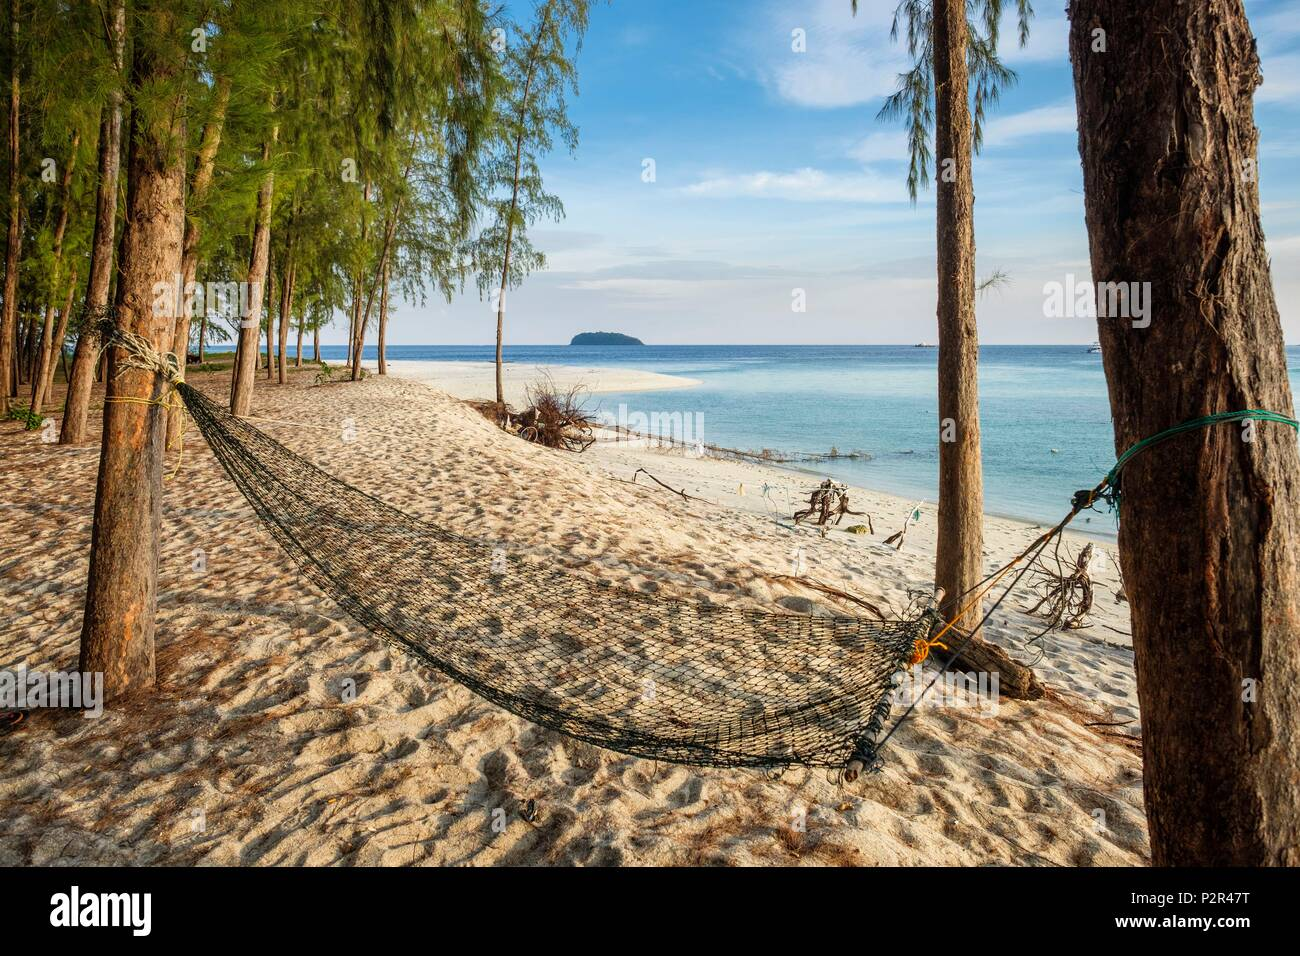 La Thaïlande, province de Phang Nga, Parc national marin de Tarutao, Ko Adang, plage de Laem Son bordé de filaos Photo Stock